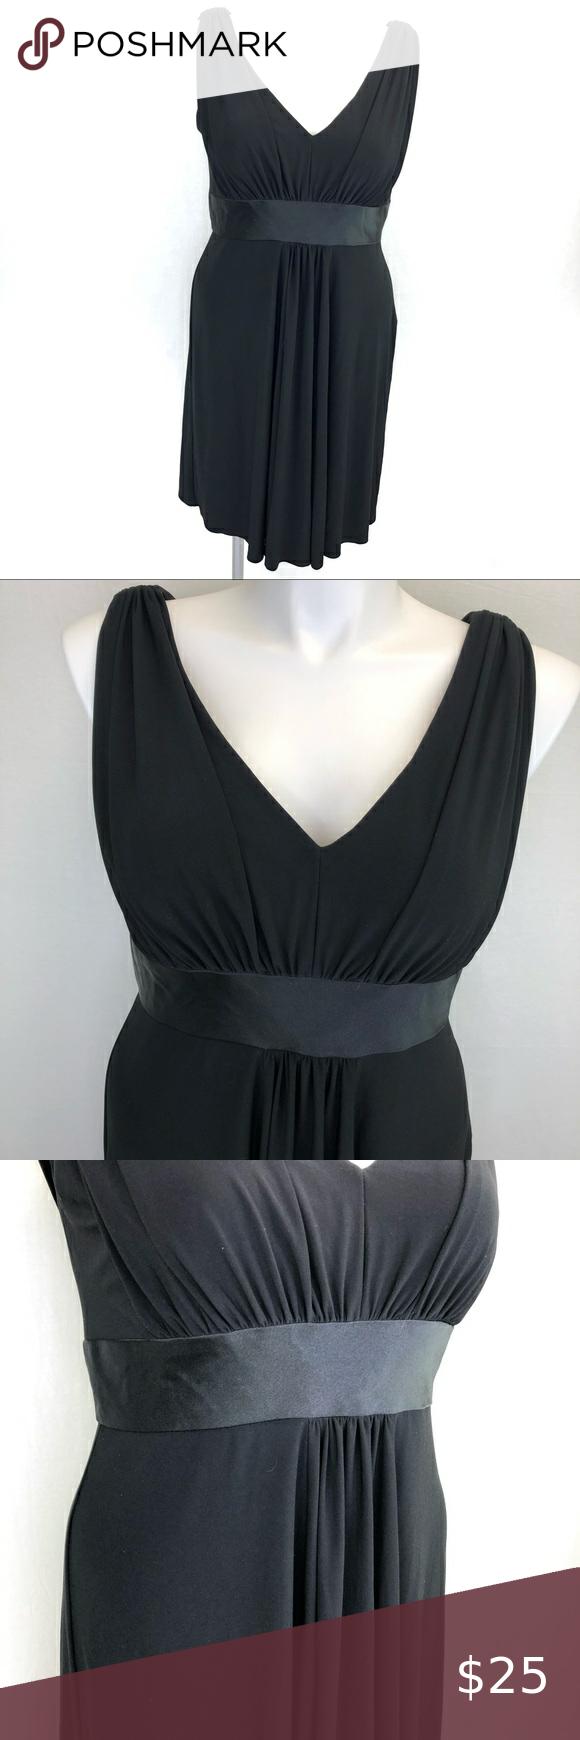 Jones Wear V Neck Dress Black Size 16 Gorgeous Black Dress By Jones Wear V Neck With A Layered Look And Pleat Gorgeous Black Dress Black Dress V Neck Dress [ 1740 x 580 Pixel ]